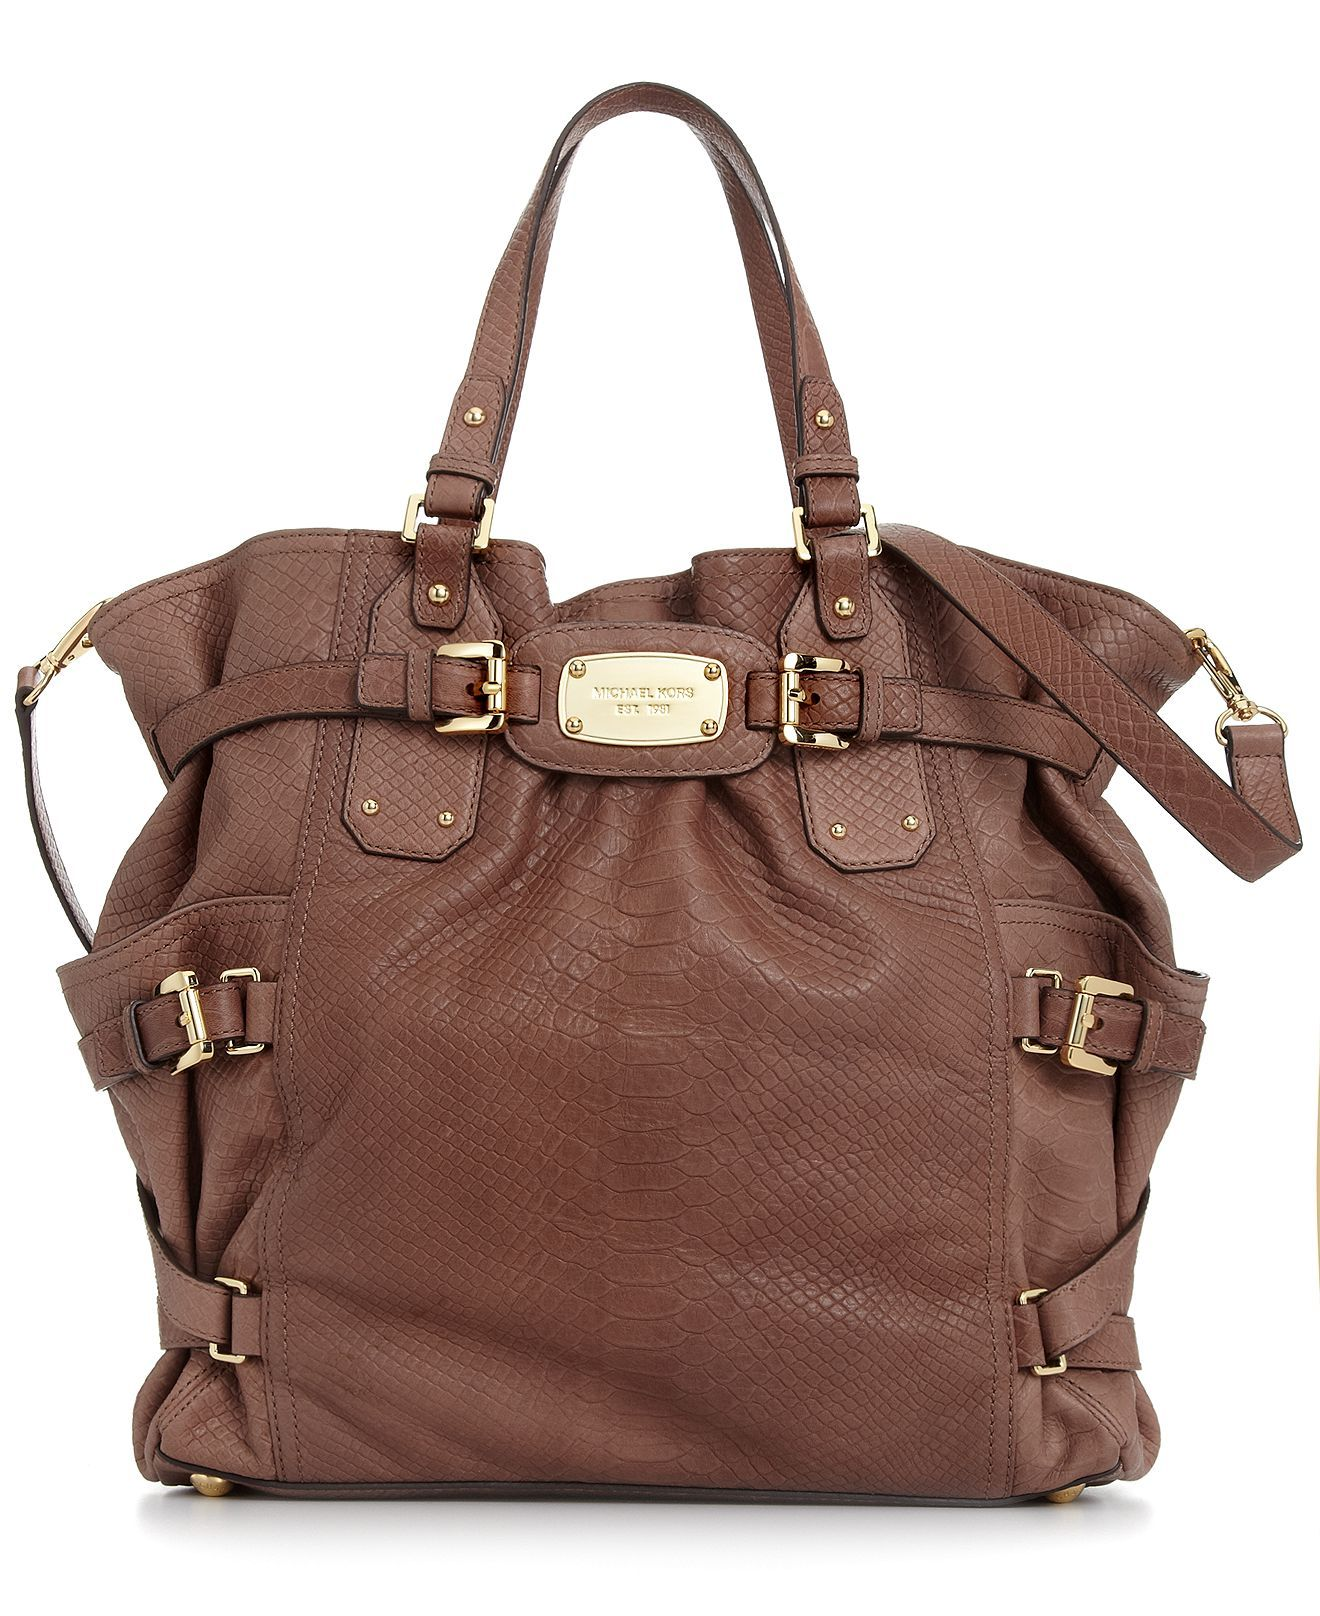 203c03ded4bfc6 MICHAEL Michael Kors Handbag, Gansevoort Tote | My Style | Pinterest